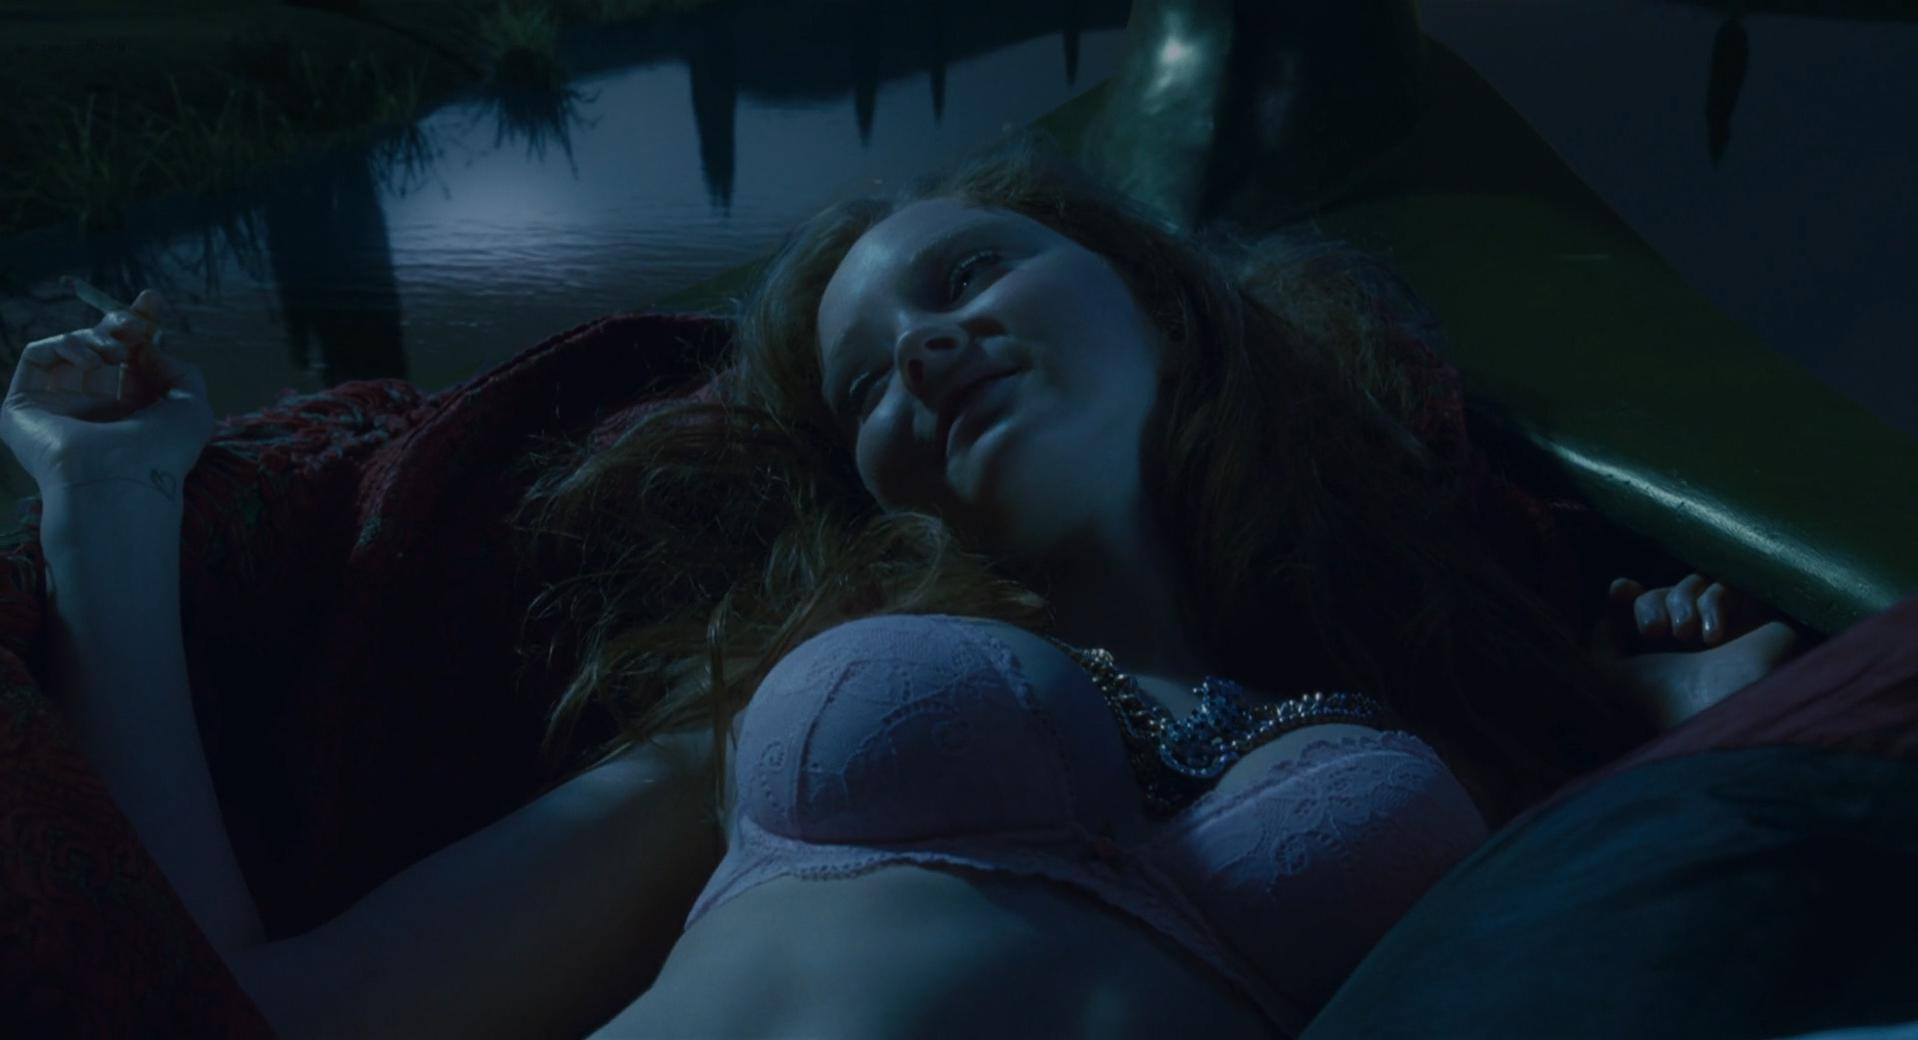 Lily Cole sexy - The Imaginarium of Doctor Parnassus (2009)